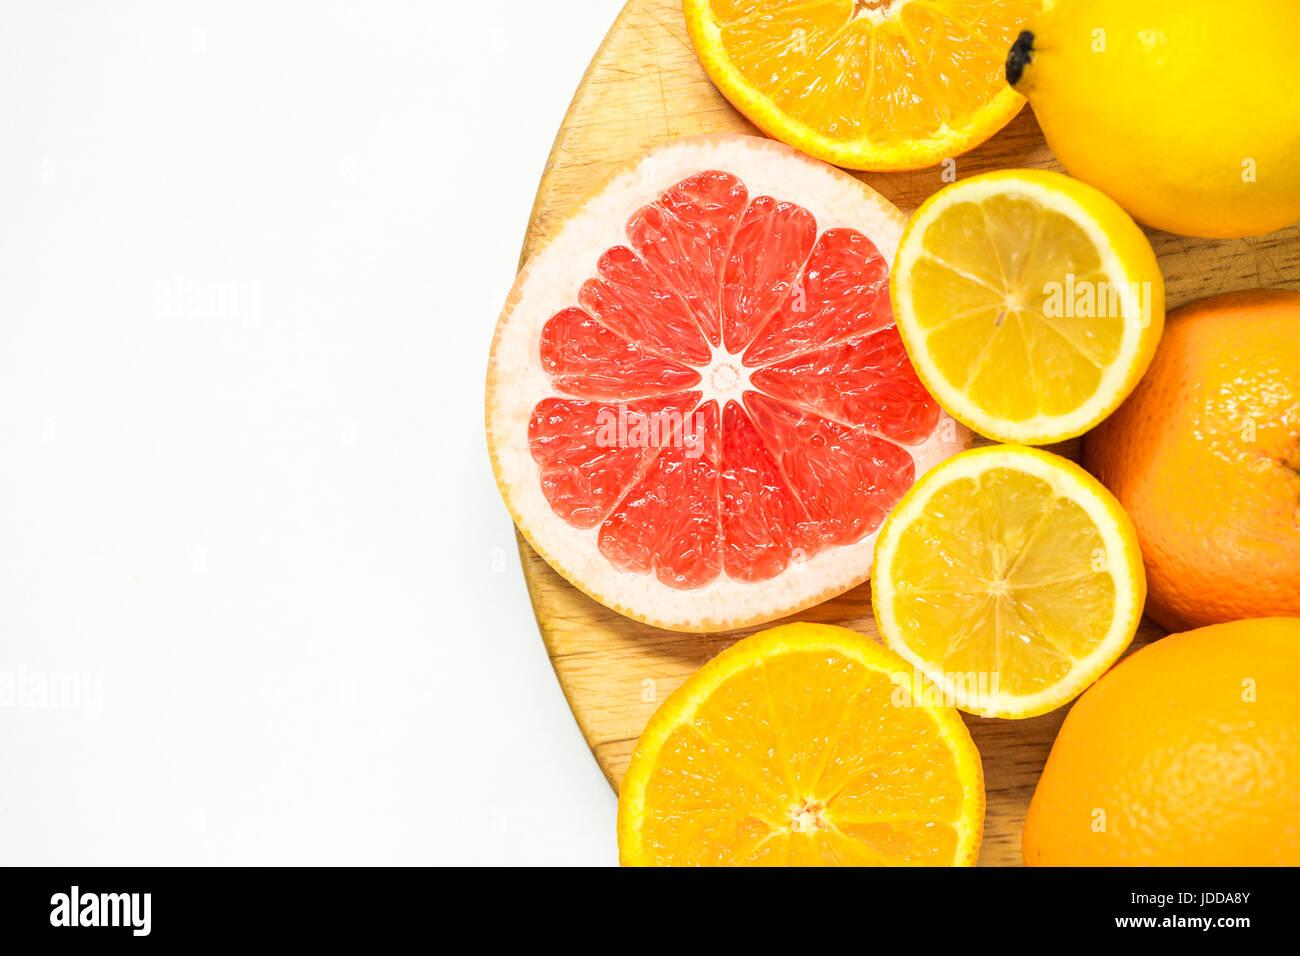 Vitamin C fruits - lemon, orange and grapefruits slices on woden cutting board on white background - Stock Image